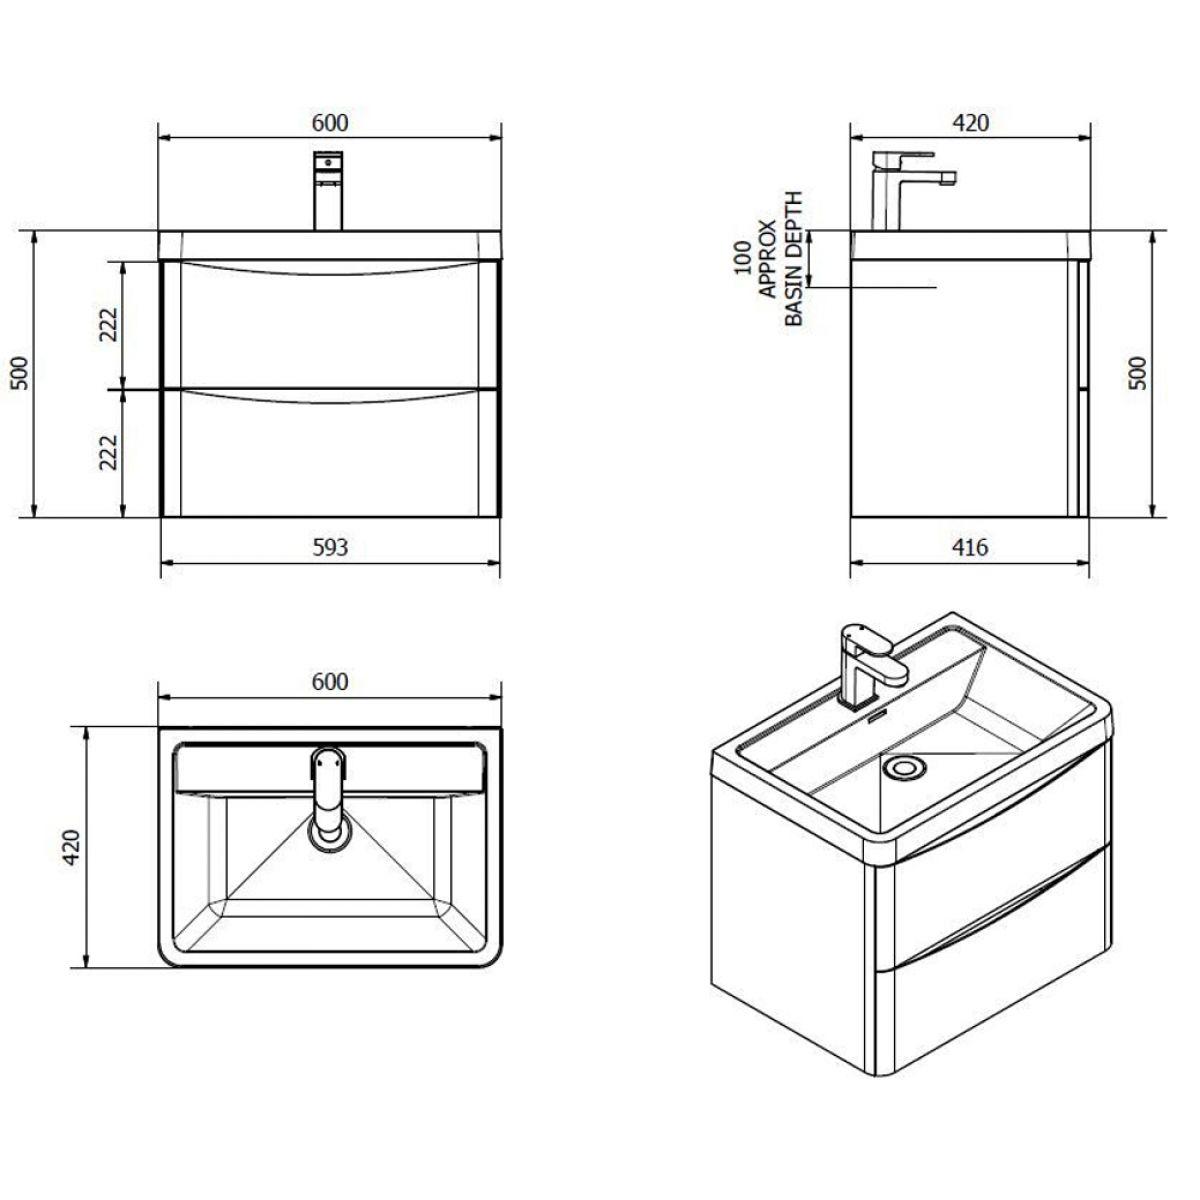 Bali Chestnut Floor Standing Vanity Unit 600mm Dimensions